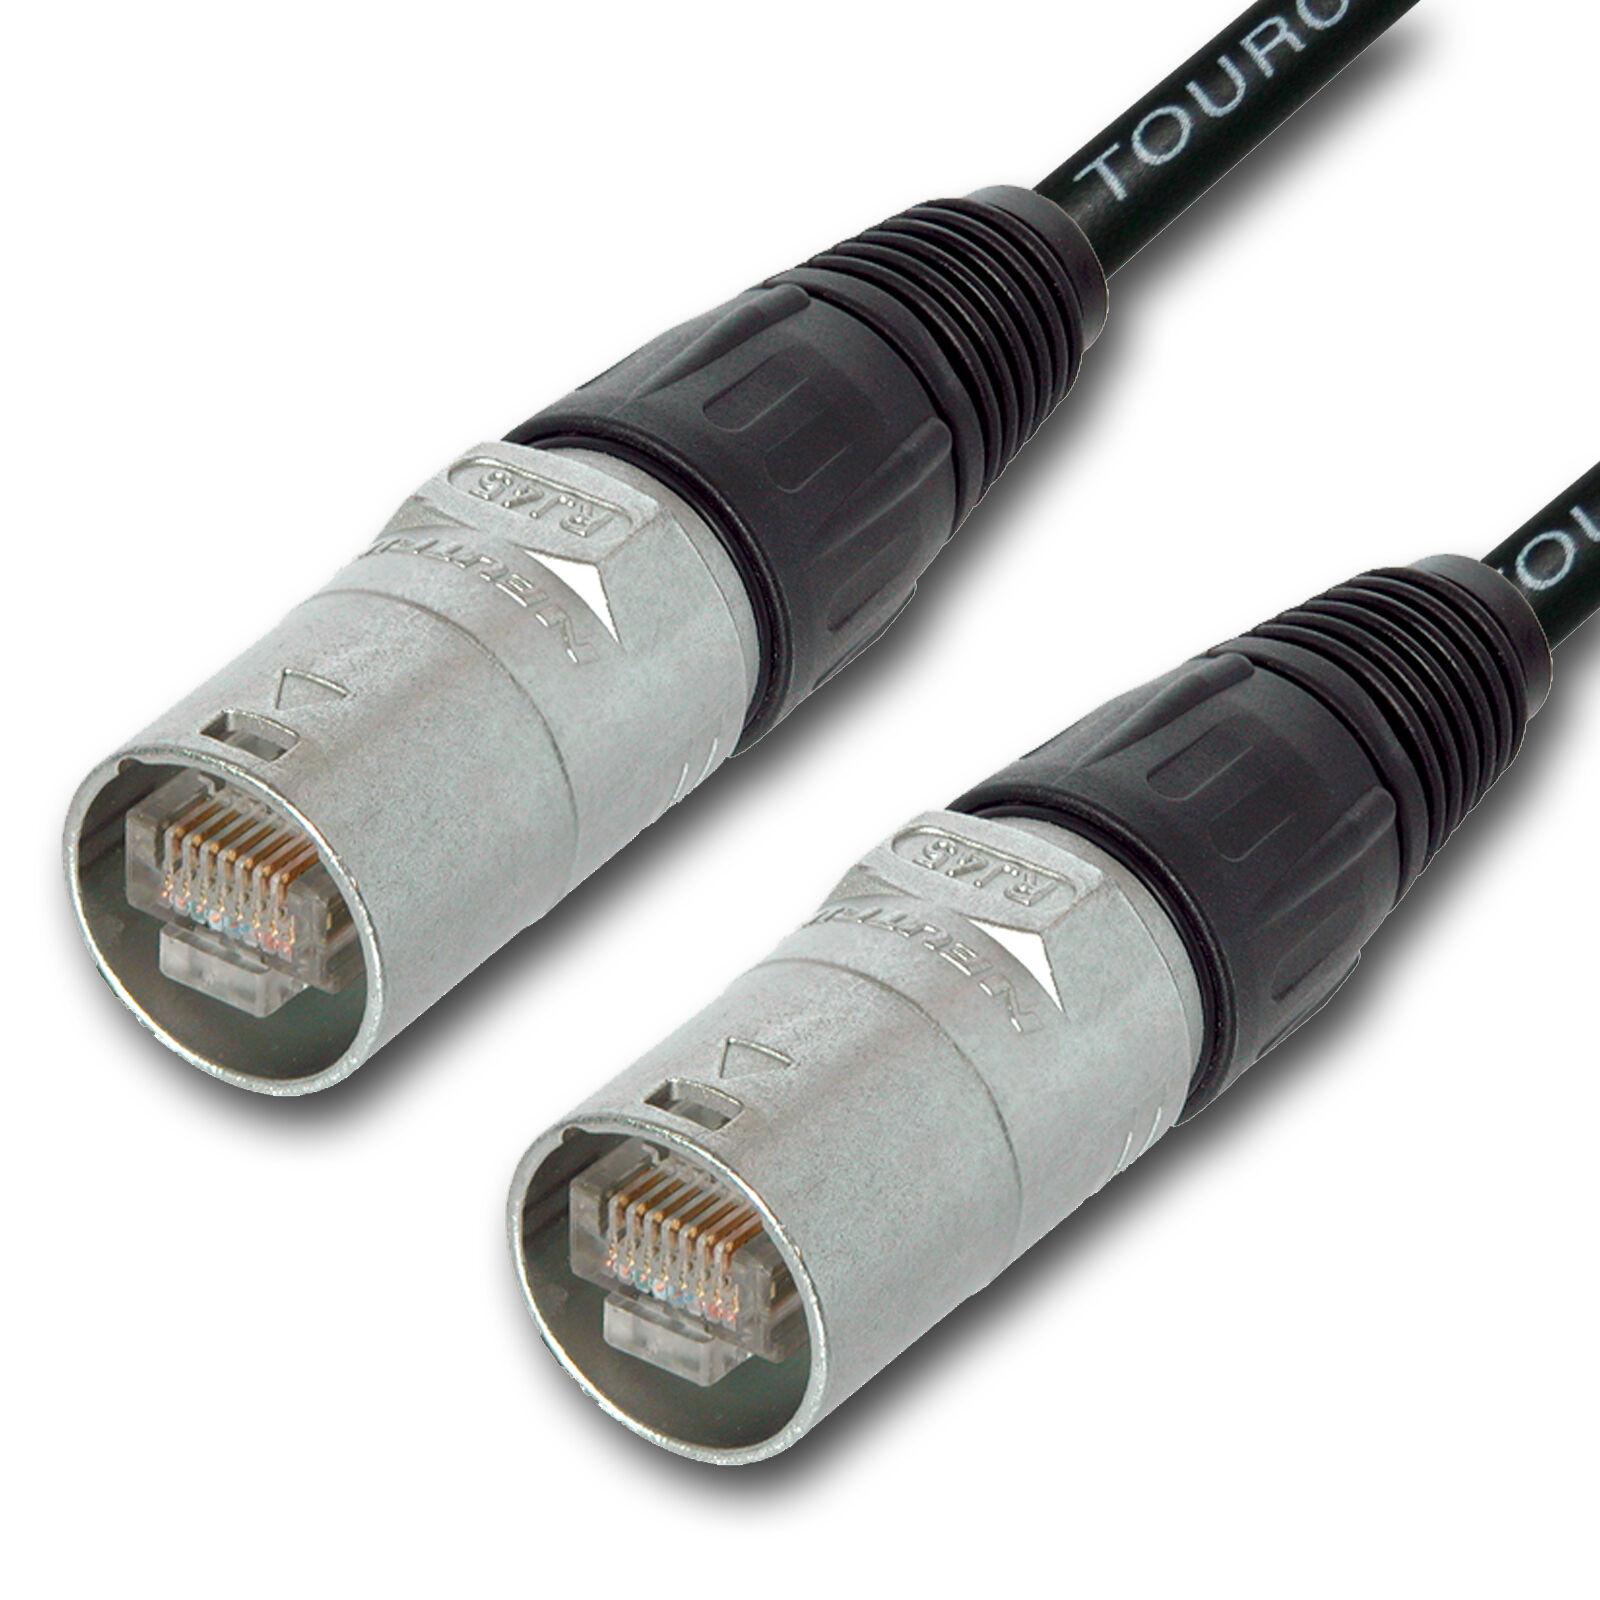 Neutrik Adapter Xlr Klinke Cable Vga A Usb Mercadolibre Vga Adapter Mac Elgiganten Xbox Remote Adapter: Premium Belden Cat5e Lead On Schill Drum / Reel. Tourcat